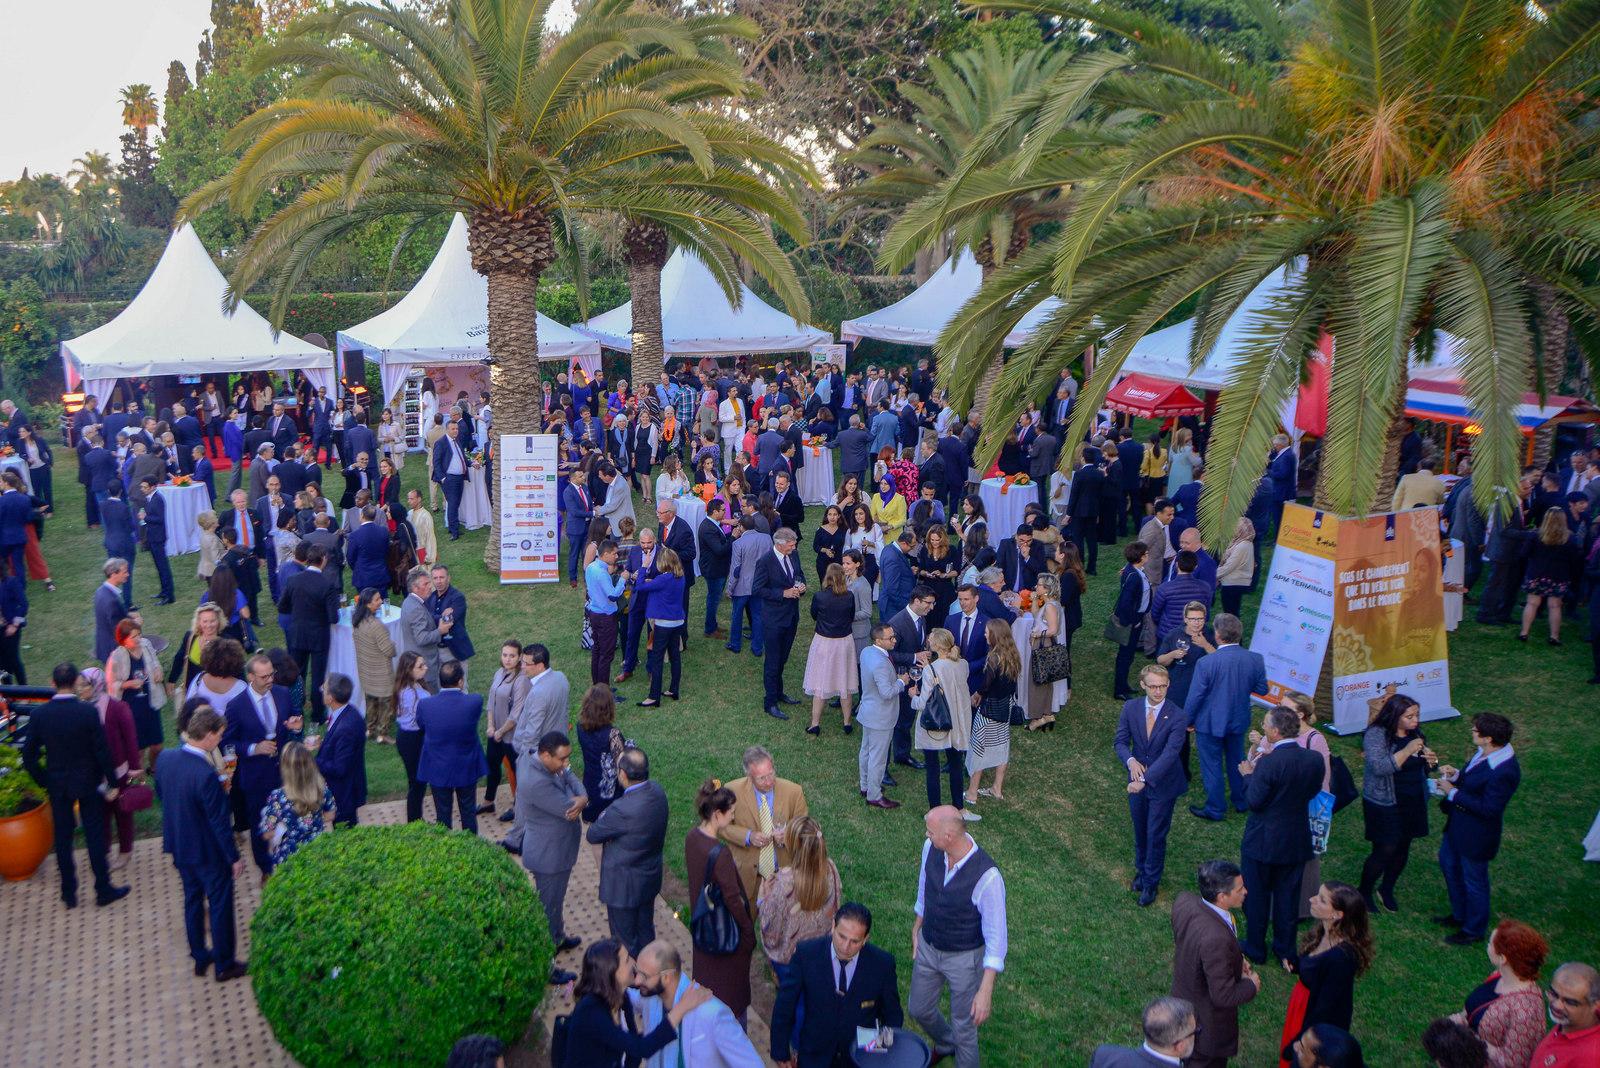 King's Day 2019 – Ambassade des Pays Bas au Maroc